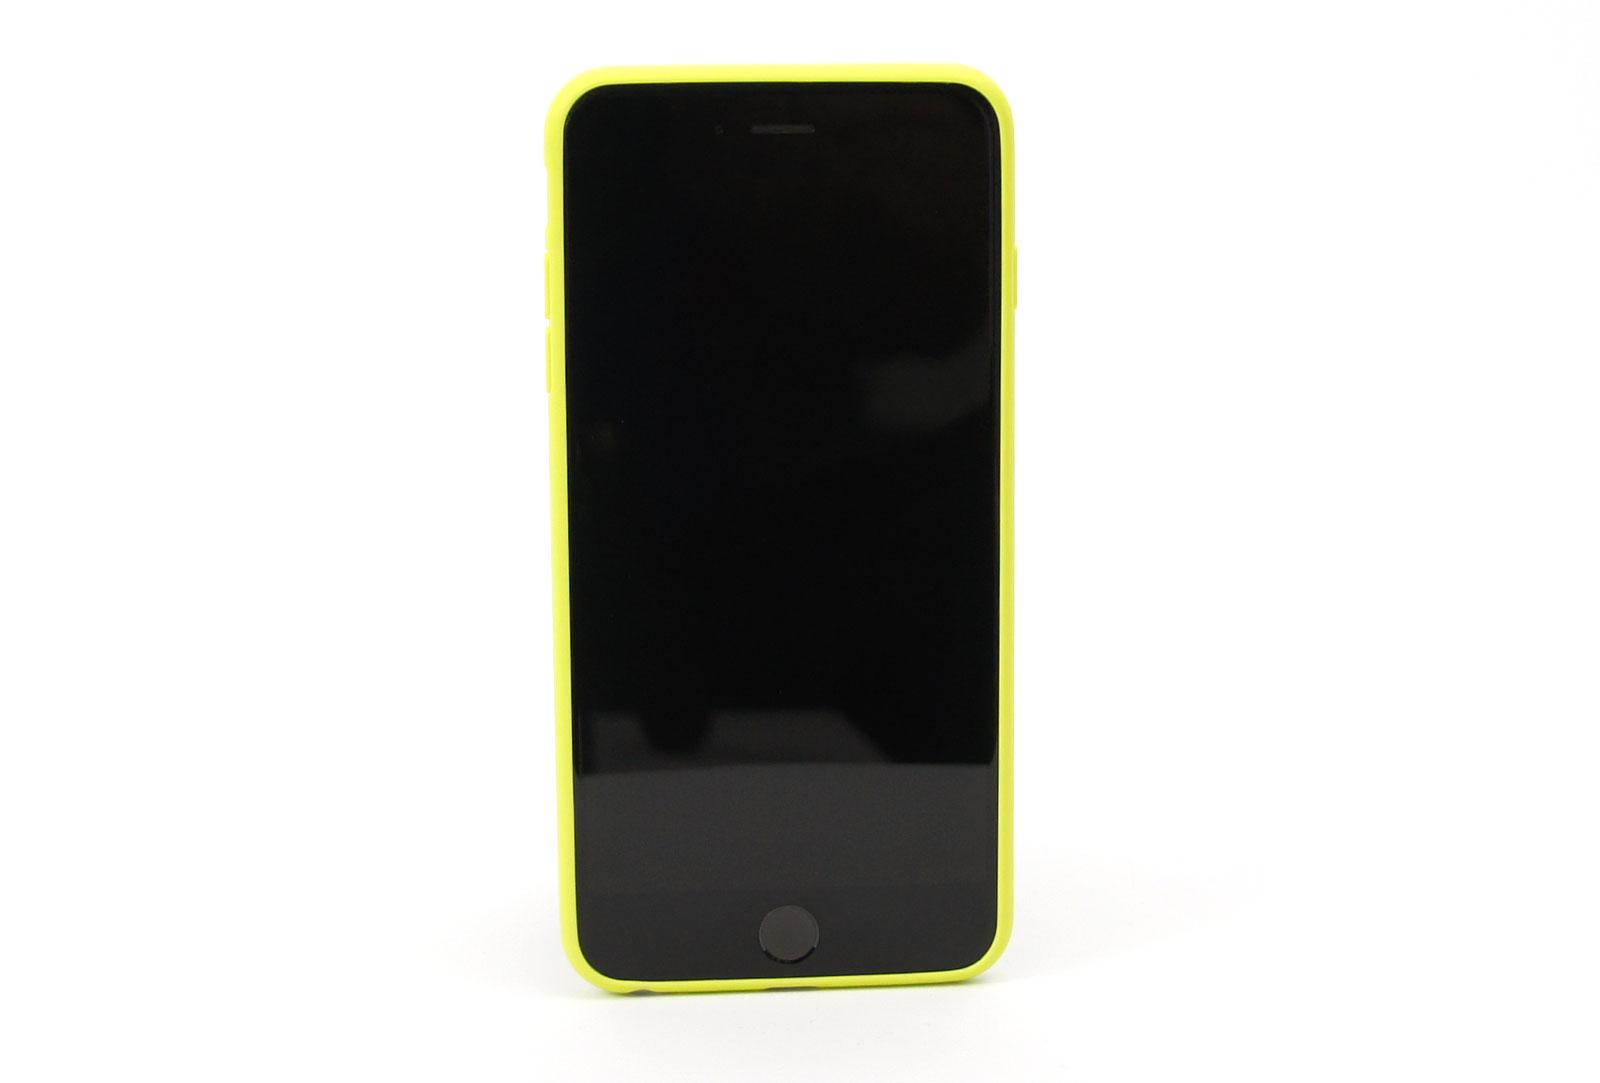 coque silicone souple jaune pour iphone 6 s plus et iphone 6 plus. Black Bedroom Furniture Sets. Home Design Ideas